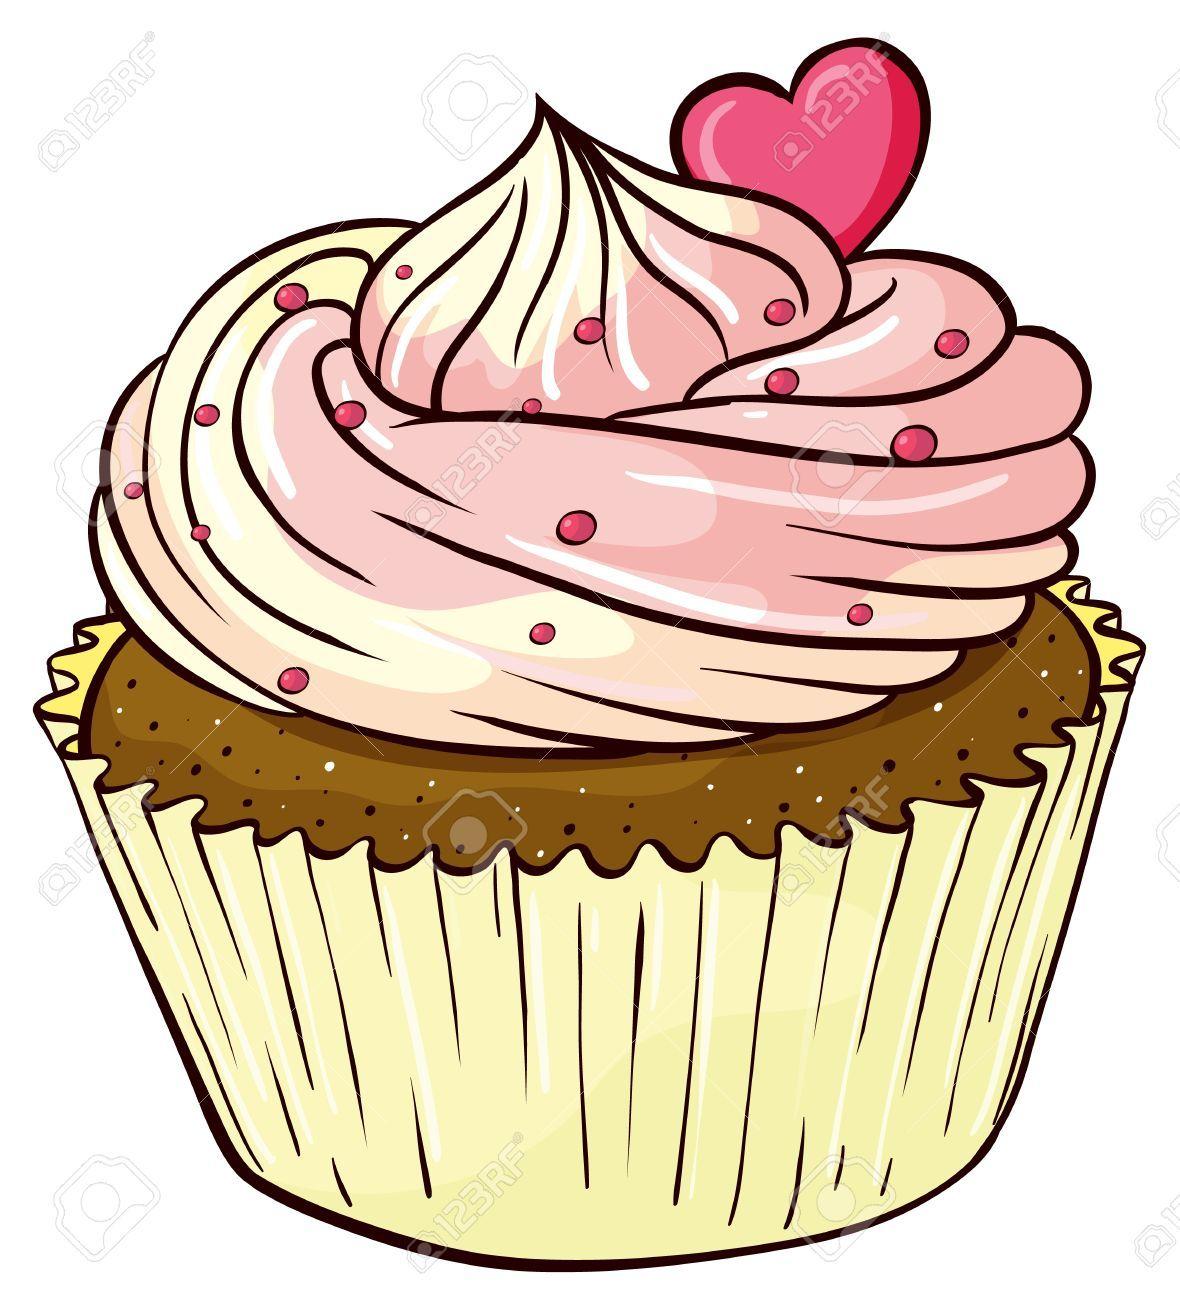 Cupcake Clipart Stock Photos Images, Royalty Free Cupcake.